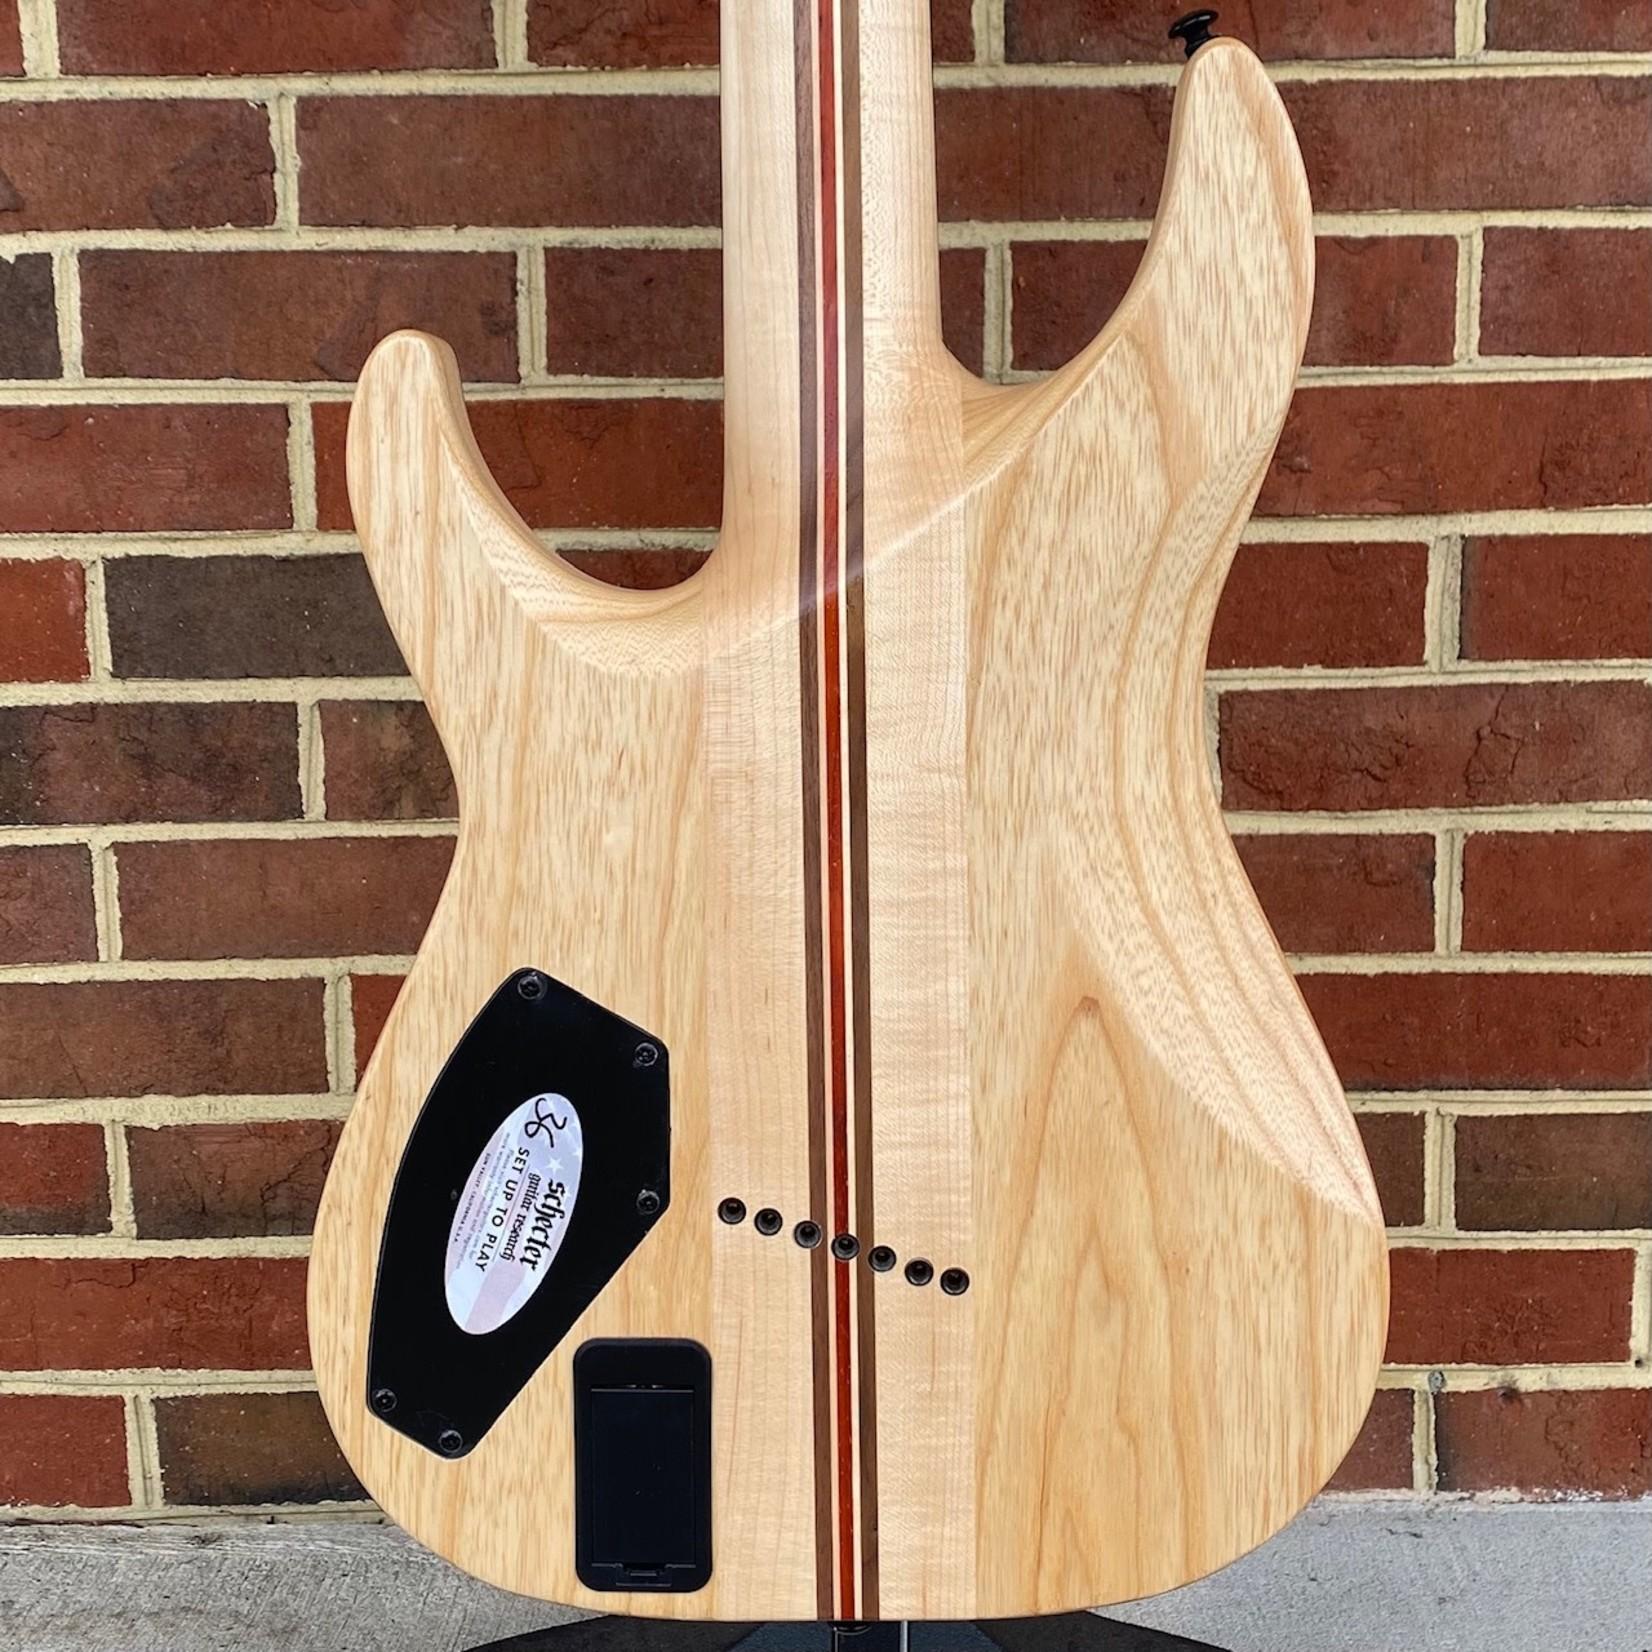 Schecter Guitar Research Schecter C-7 Multiscale SLS Elite, Gloss Natural, Flamed Maple Top, Neck Thru, Ebony Fretboard, Locking Tuners, Fishman Fluence Modern Pickups, Hipshot Bridge, SN# W21051718